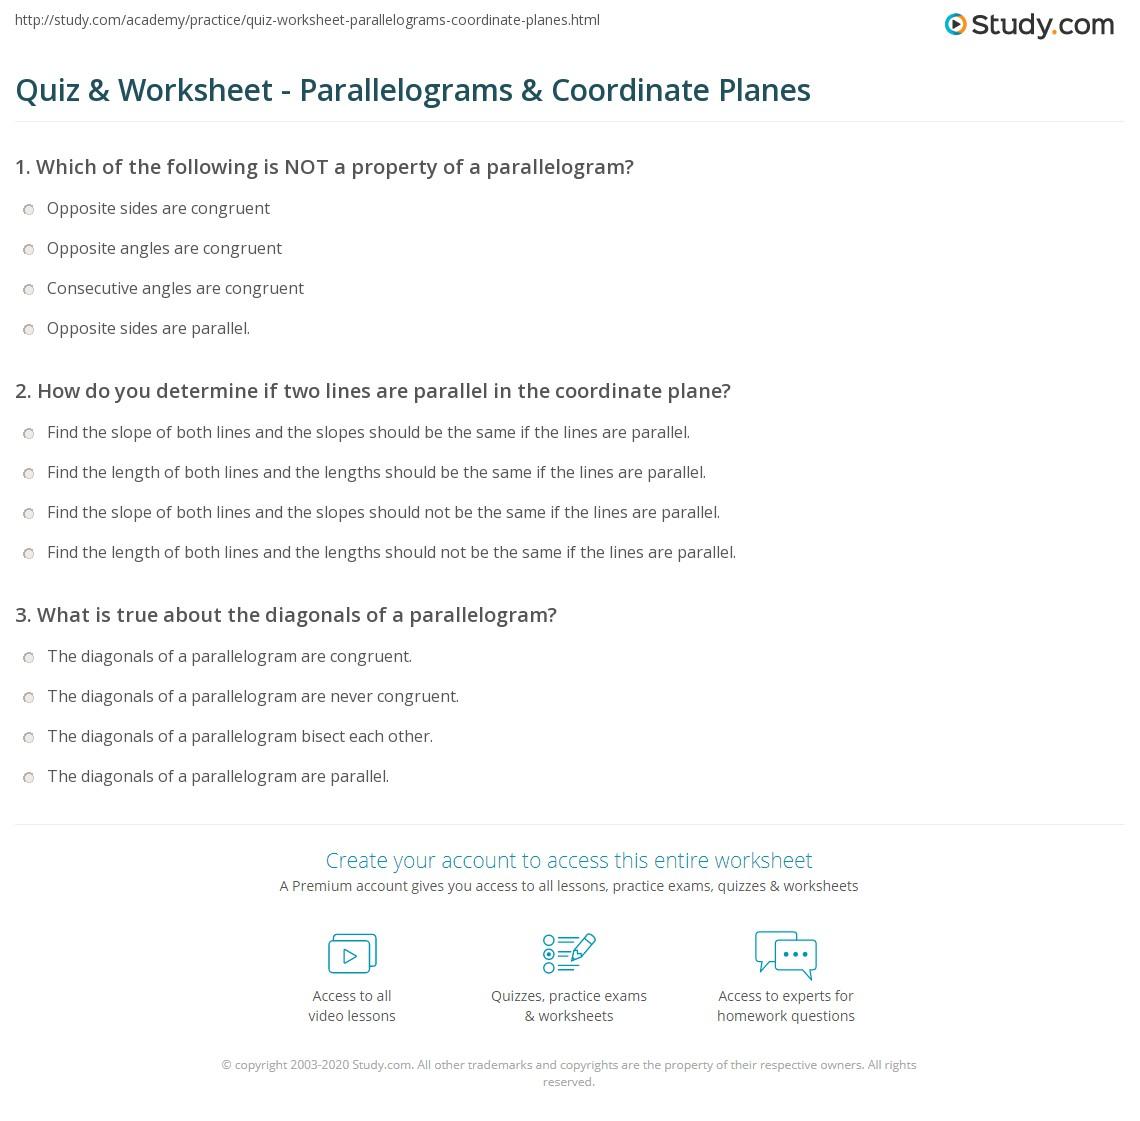 Quiz W Ksheet P R Llelogr Ms Co D Te Pl Nes Study